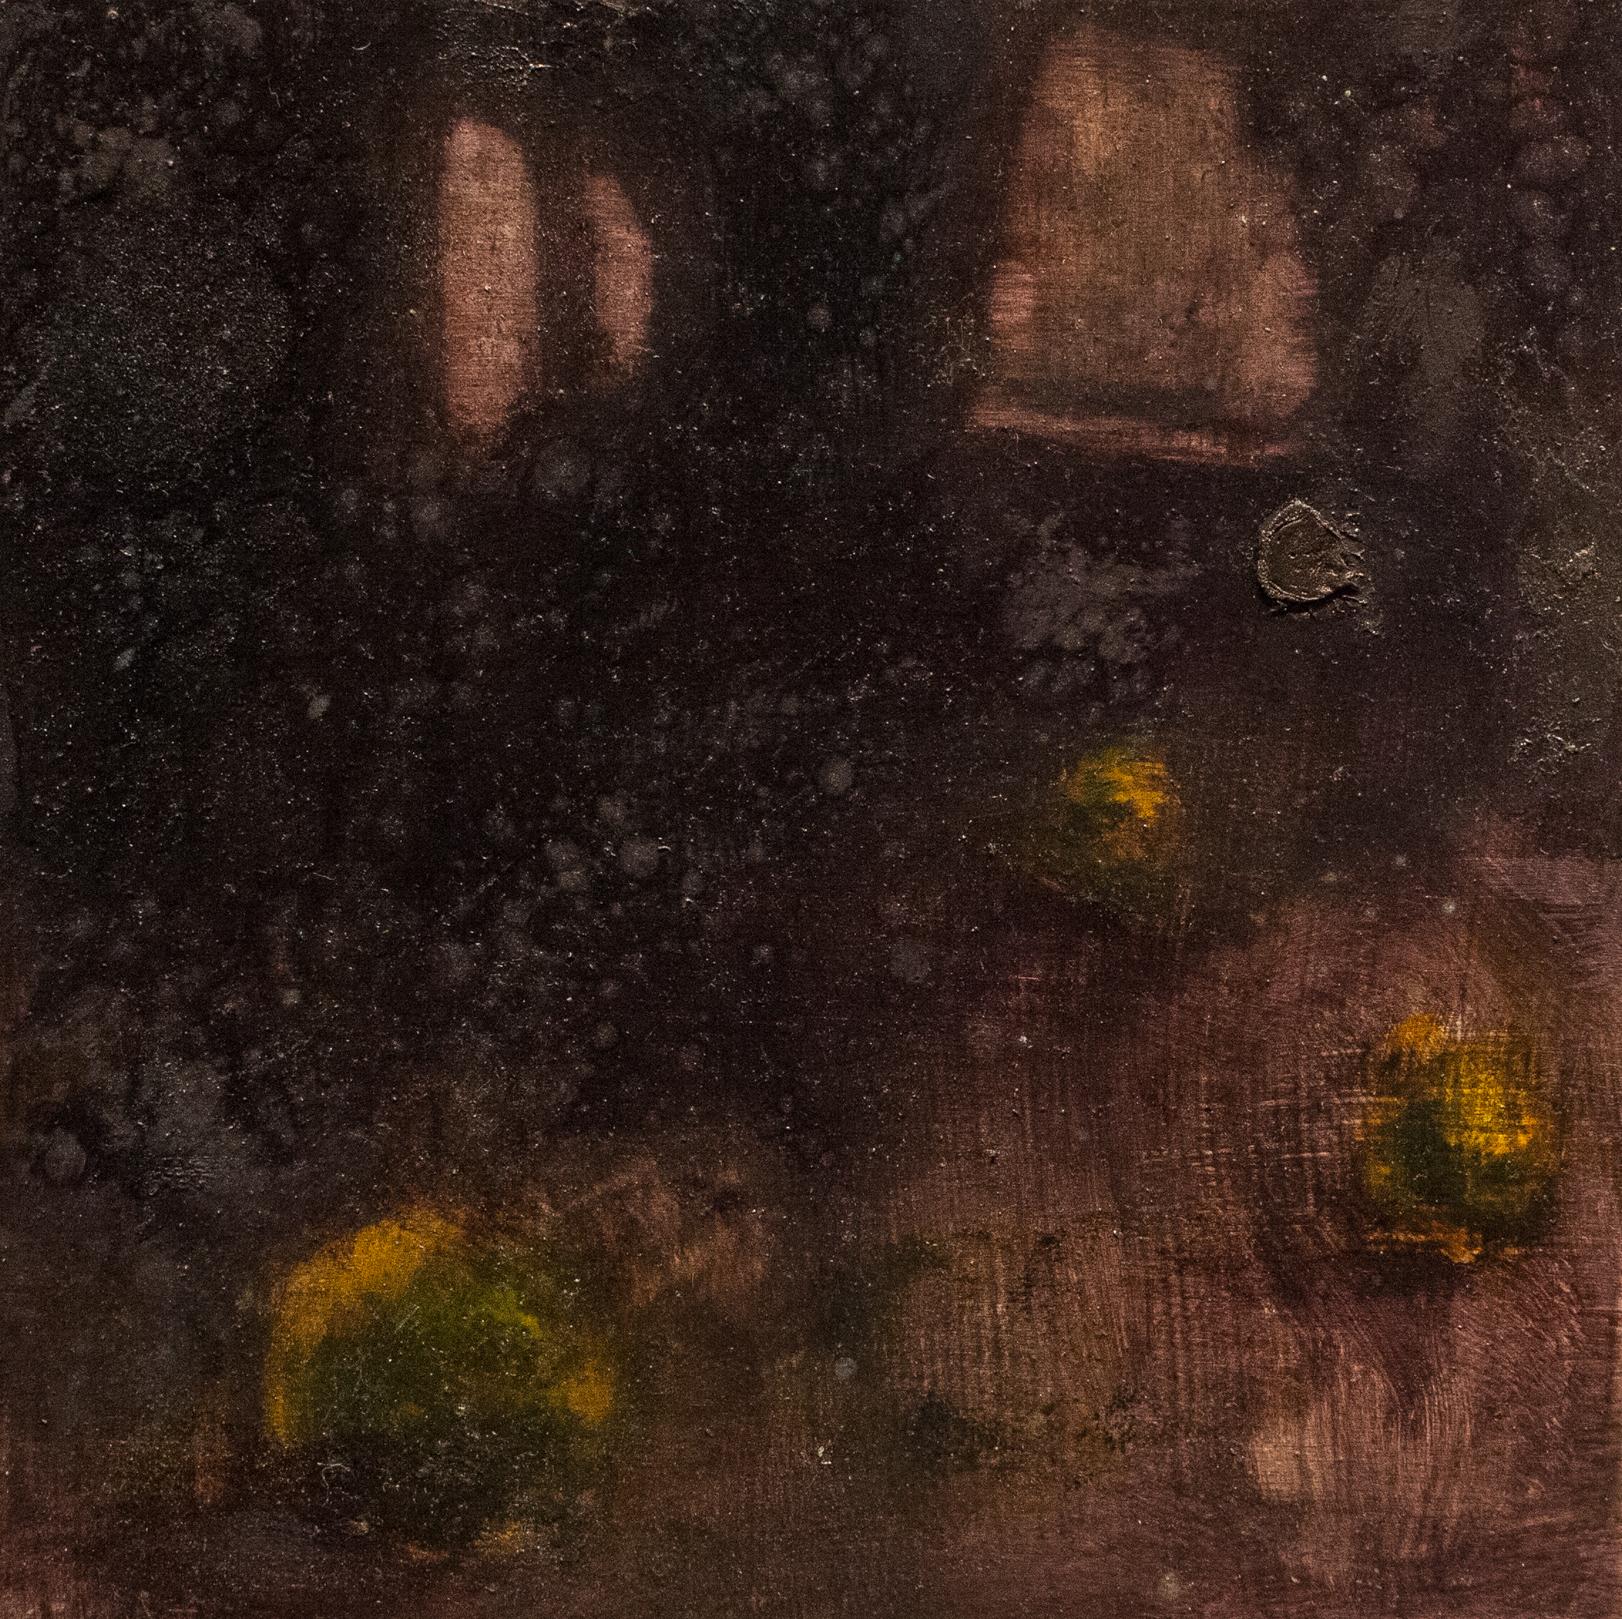 Hollow Stones III   oil on wood  8 x 8